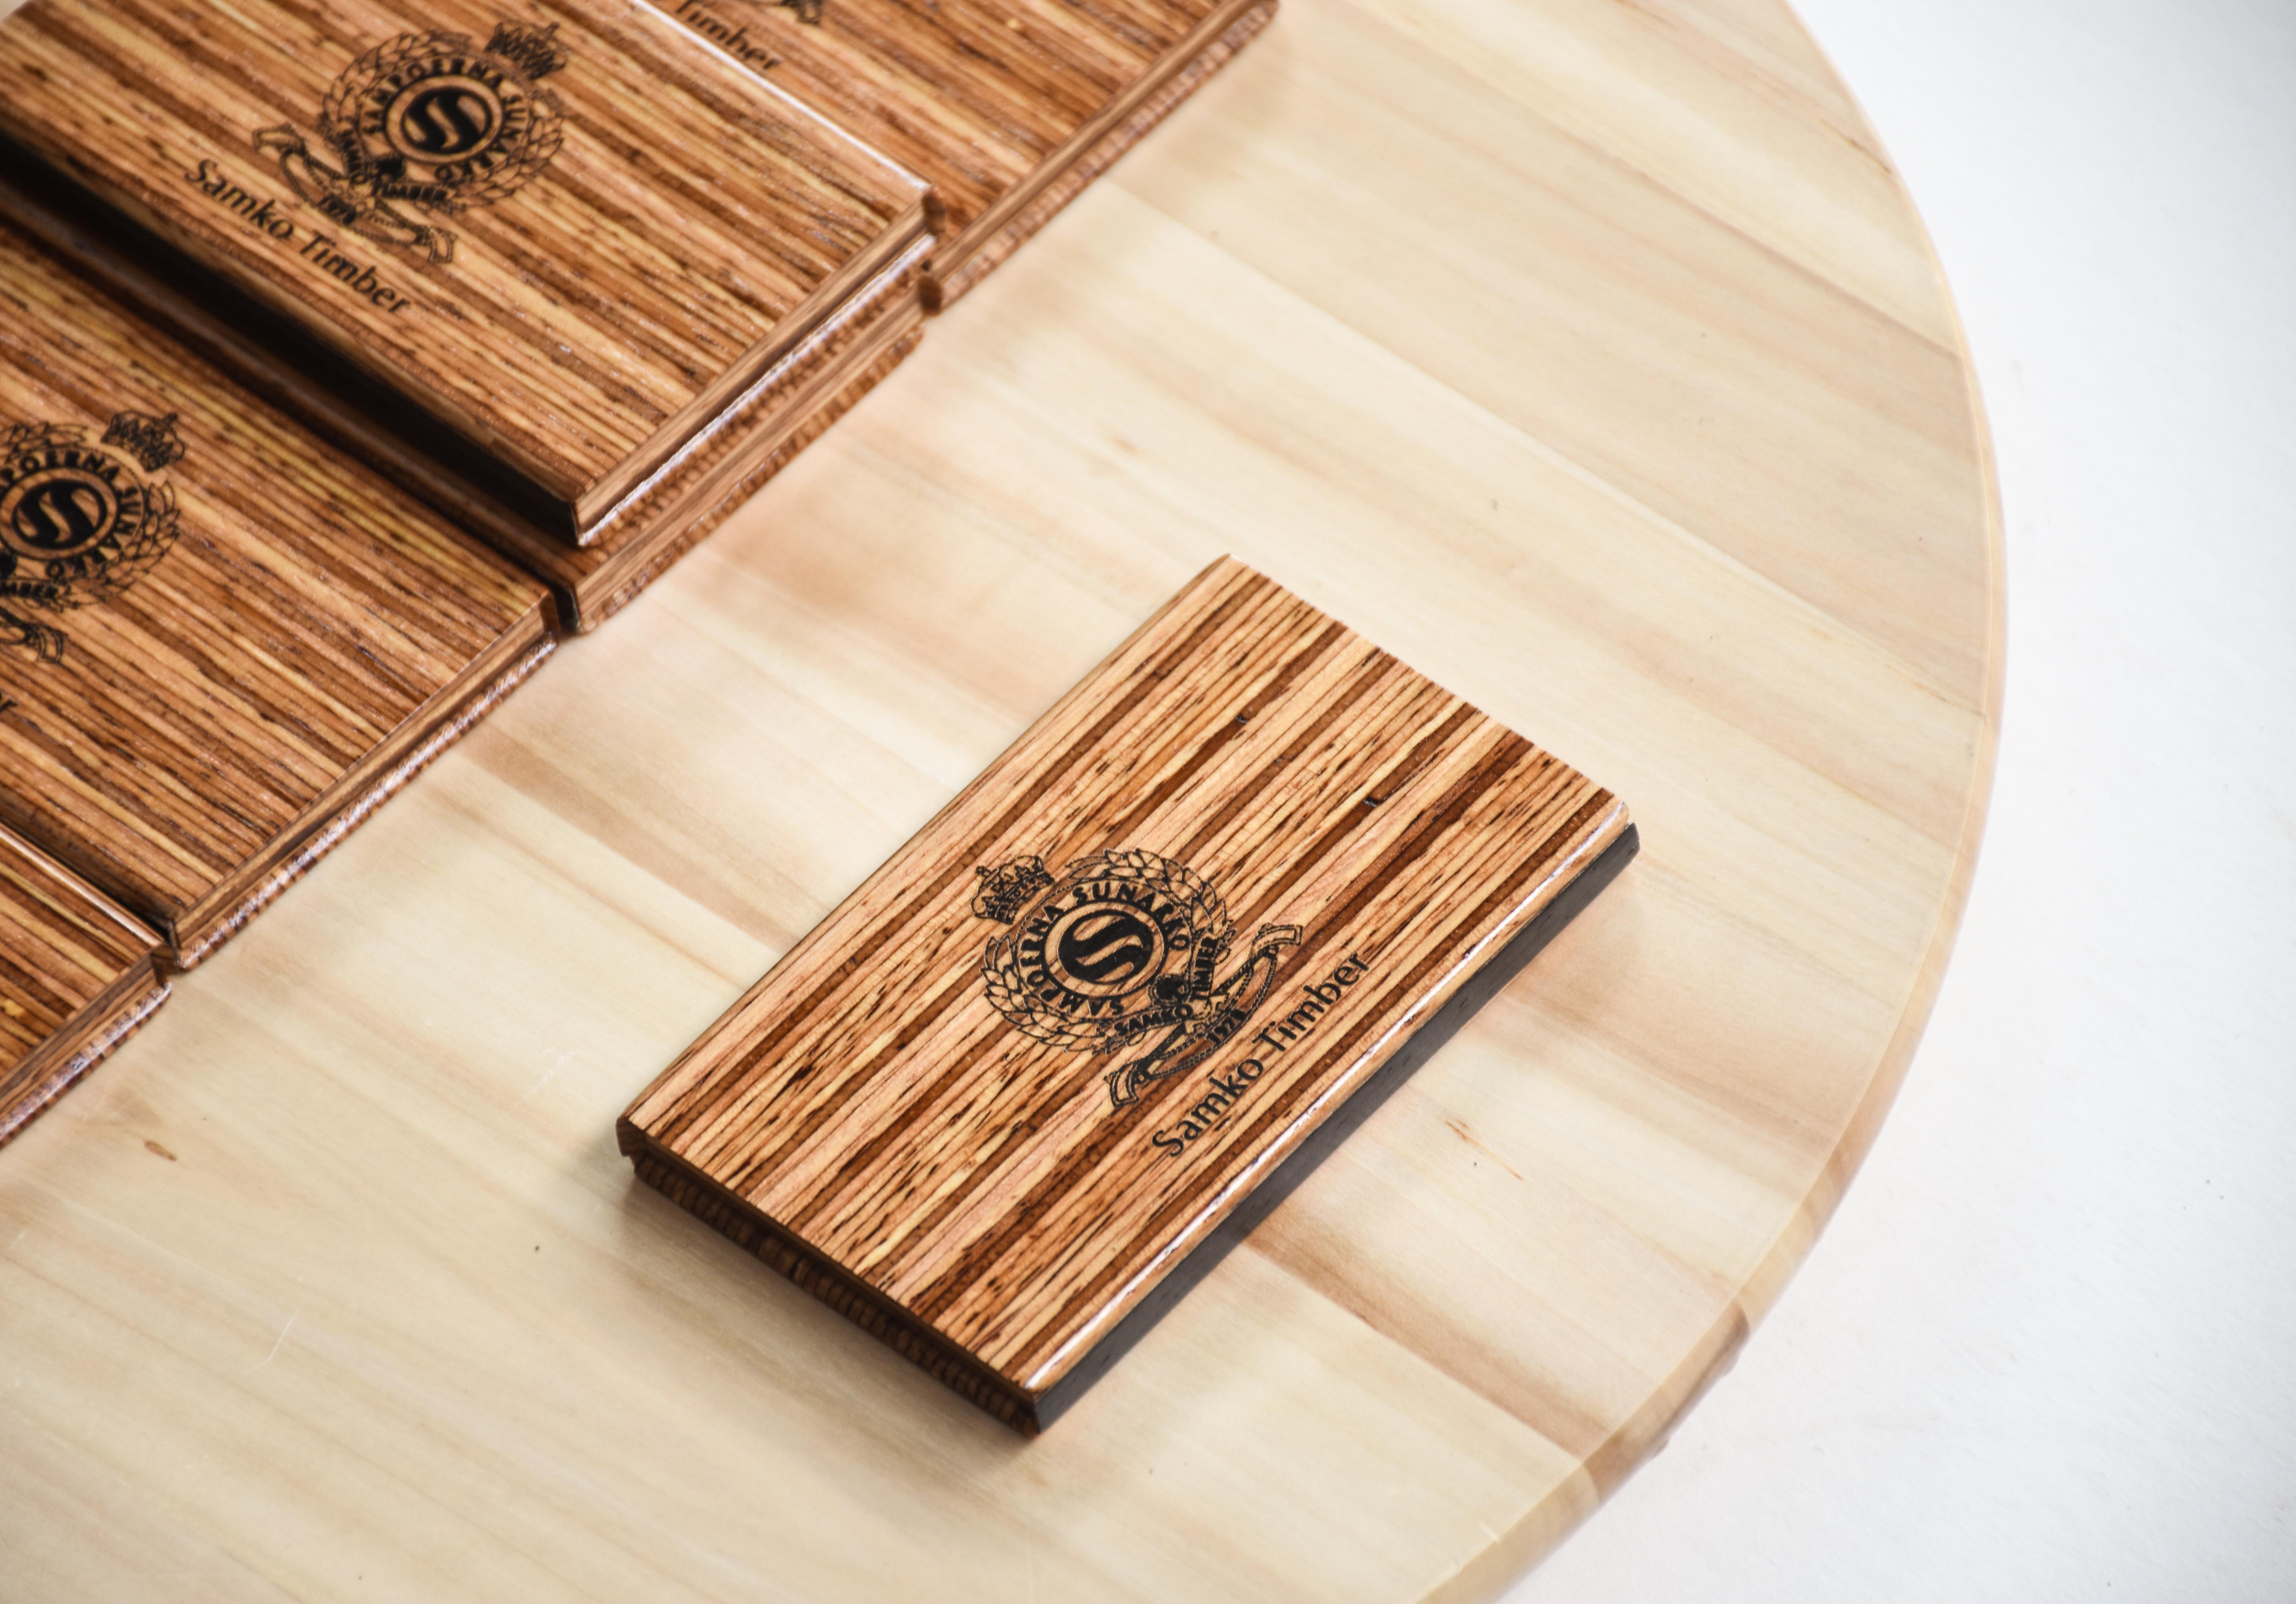 Samko Timber Engraved Businesscard